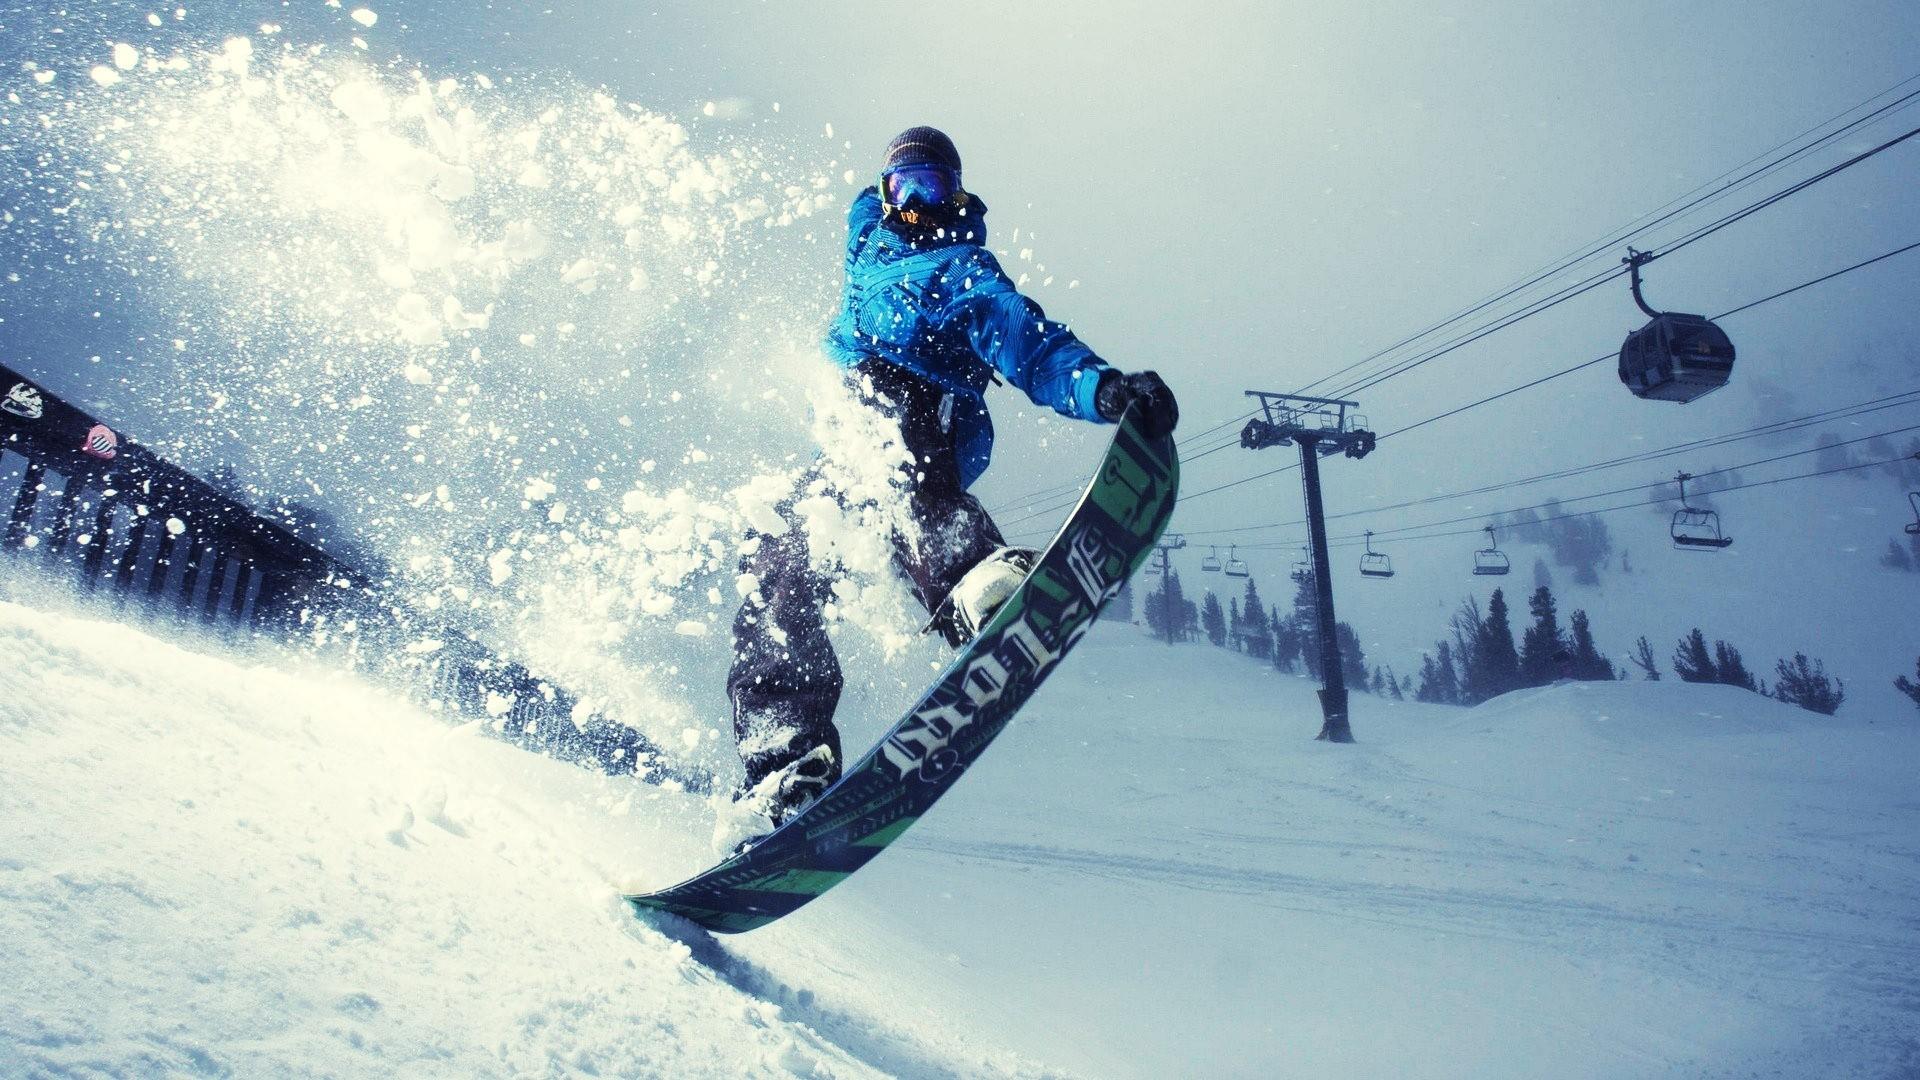 Snowboarding Backgrounds, Compatible - PC, Mobile, Gadgets  1920x1080 px